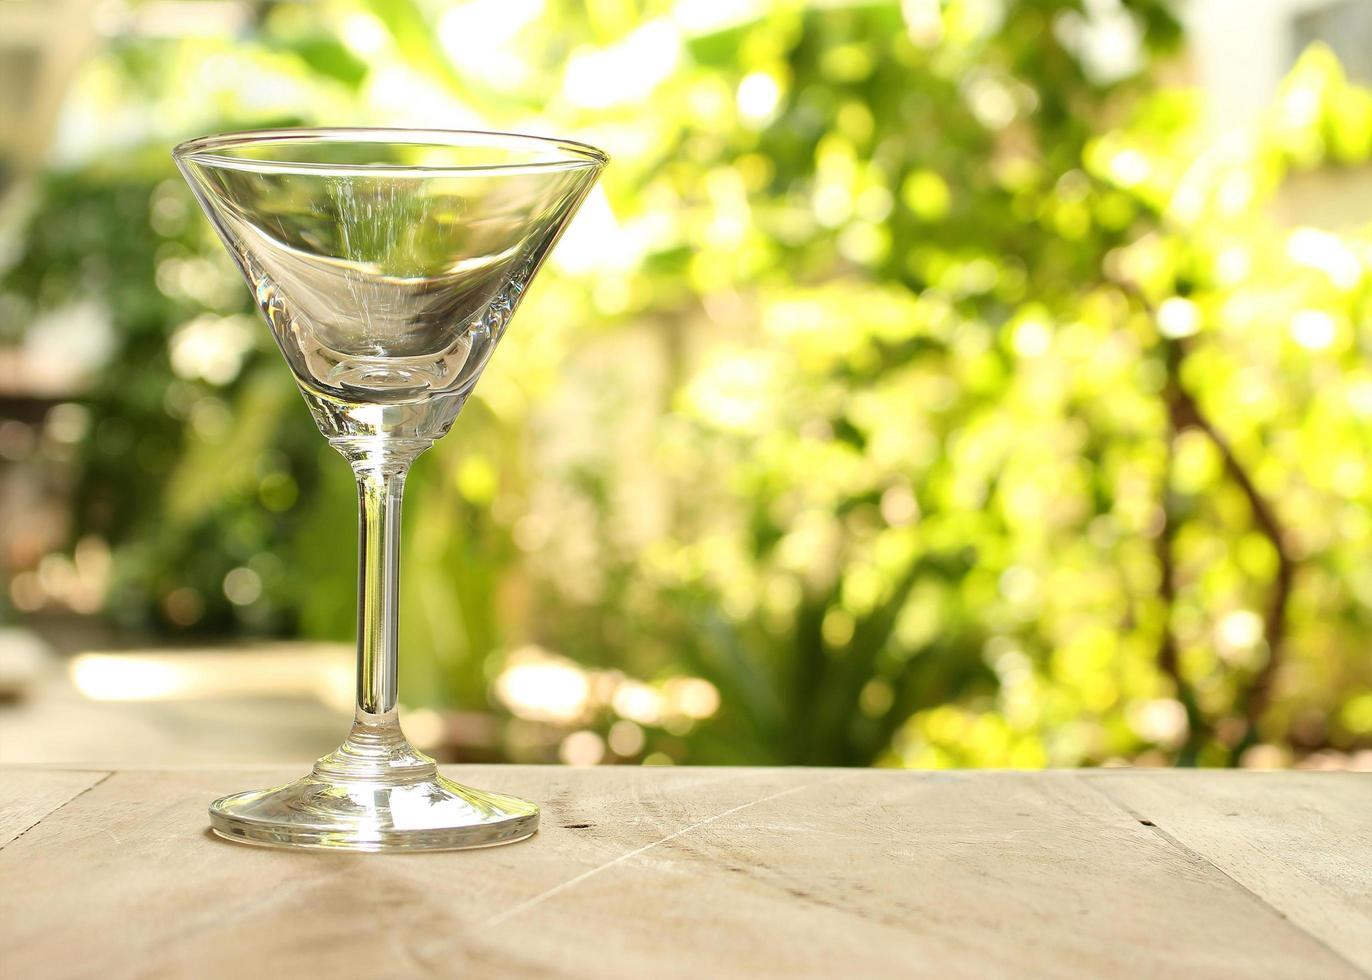 leeg martiniglas buiten foto